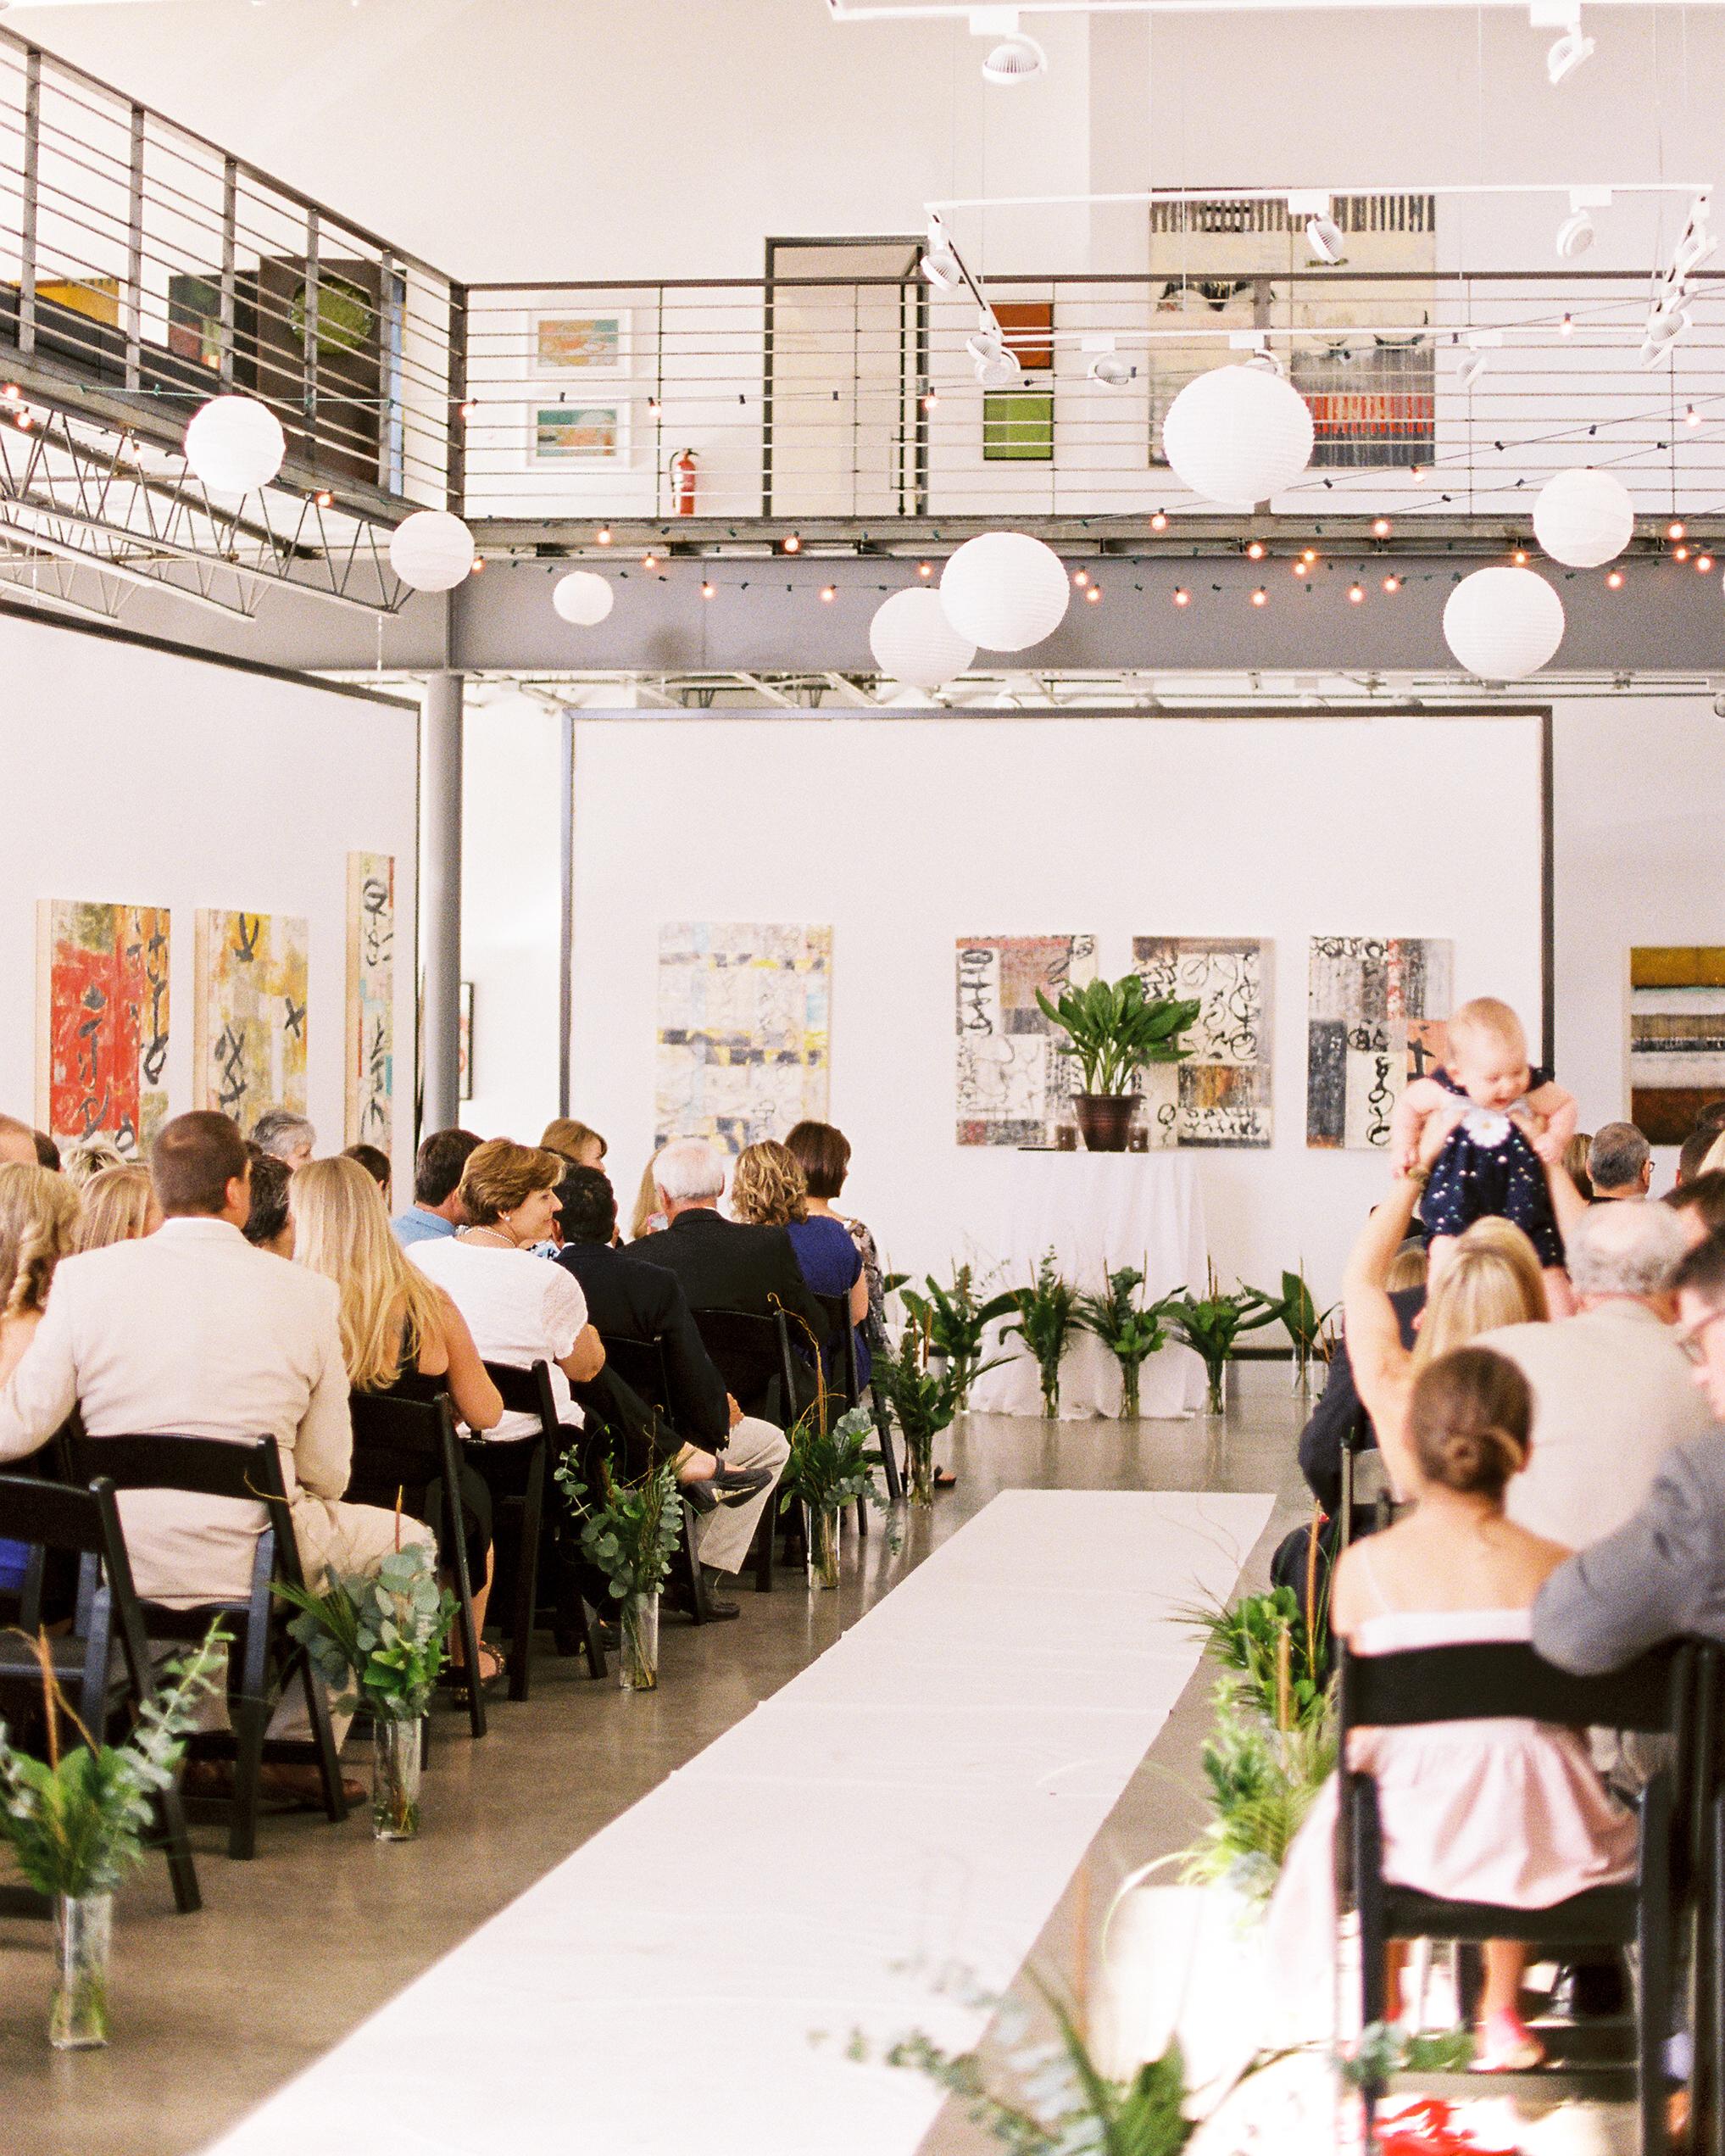 sydney-mike-wedding-ceremony-40-s111778-0215.jpg